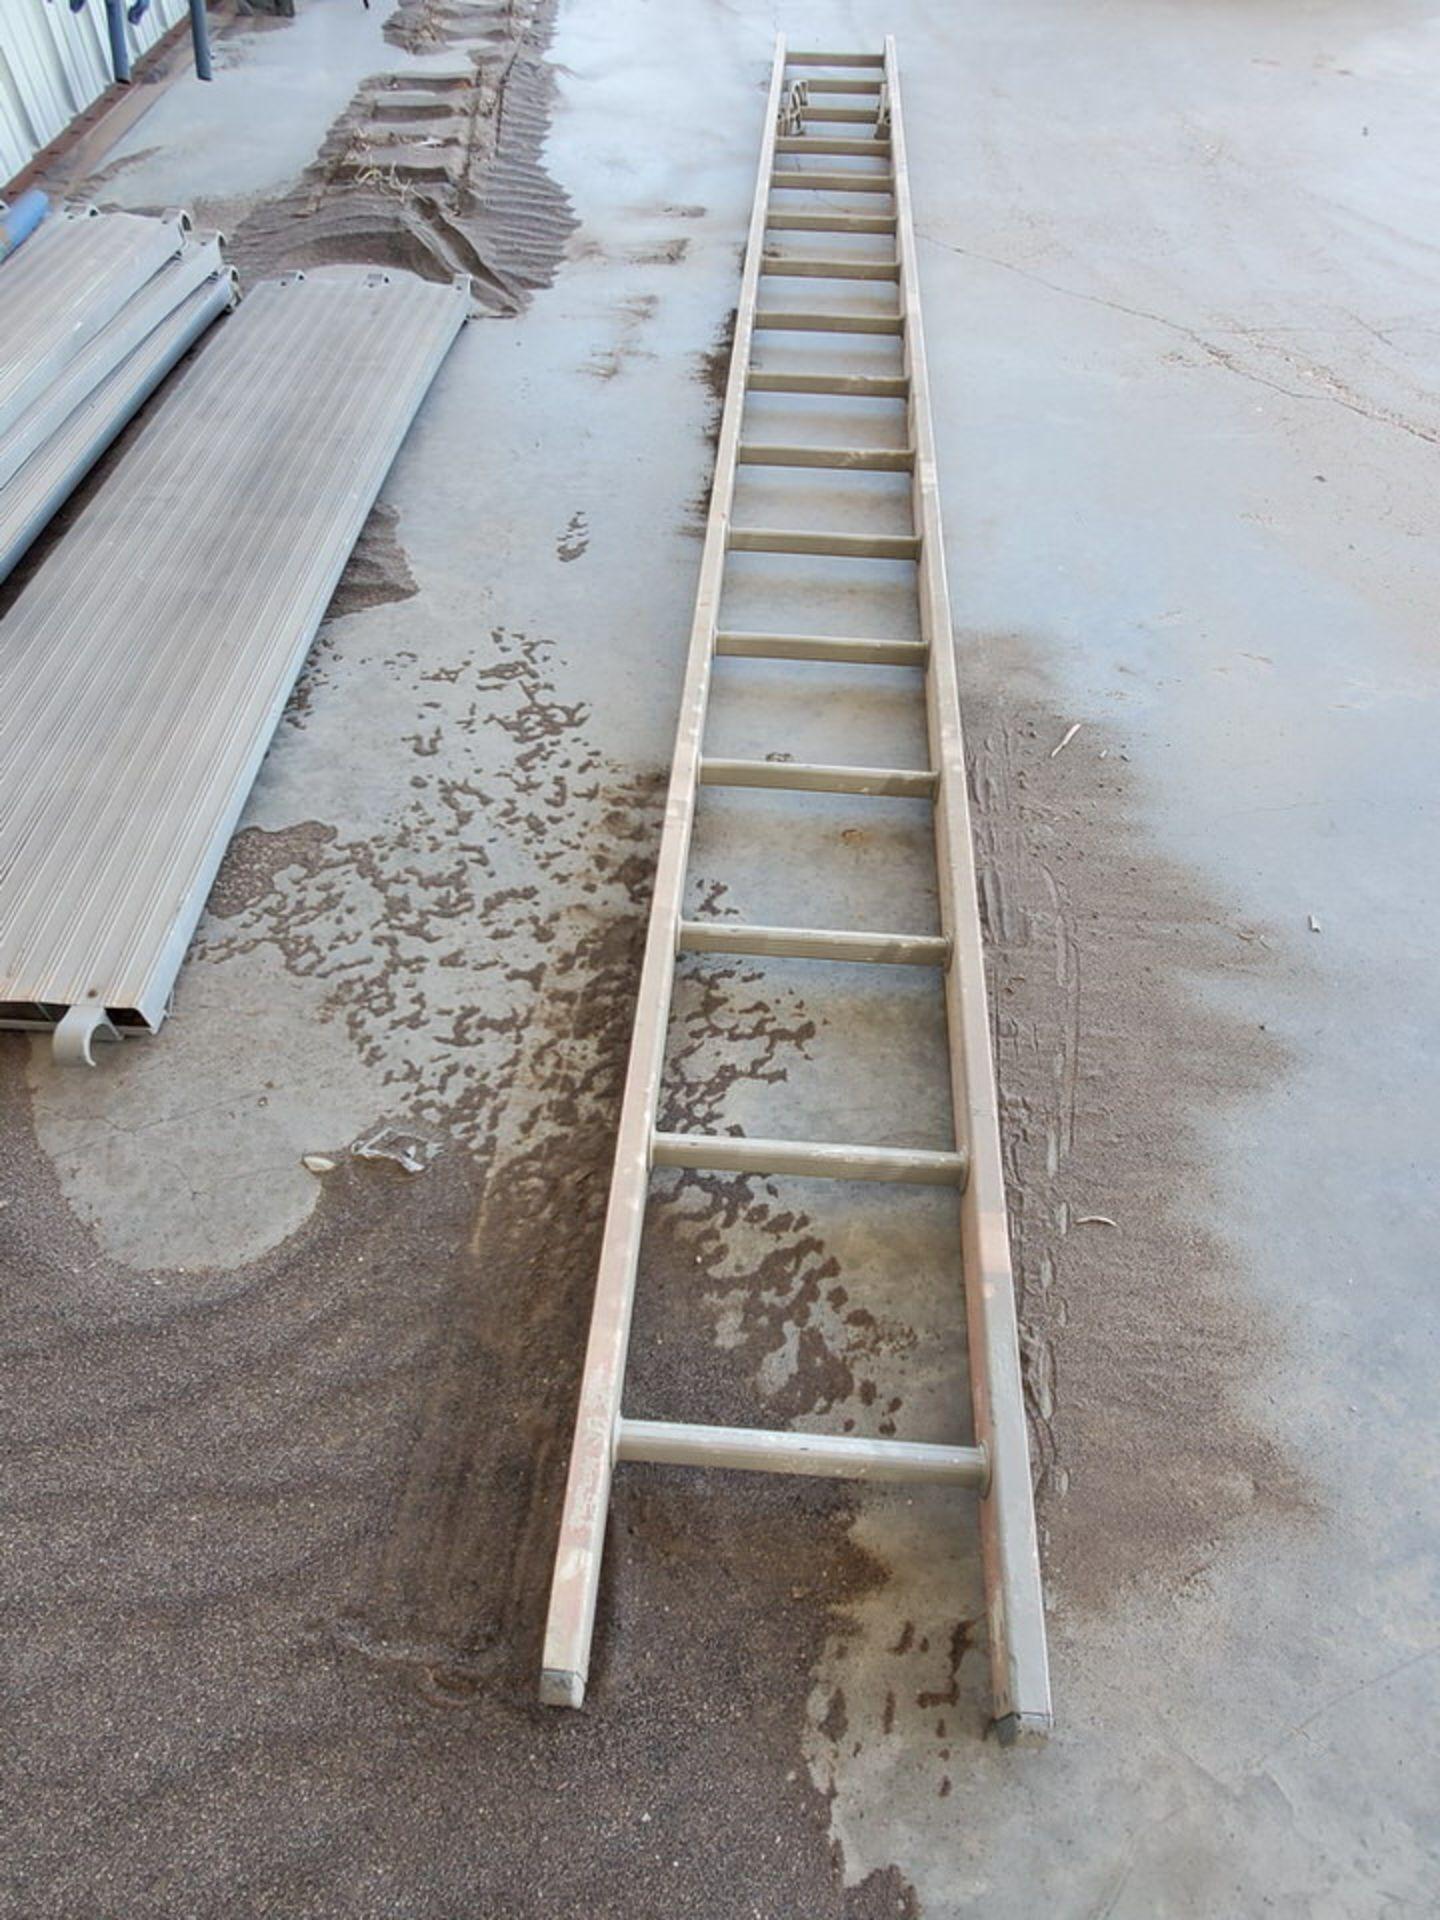 Scaffold W' 16' Fixed Alum. Ladder - Image 4 of 10